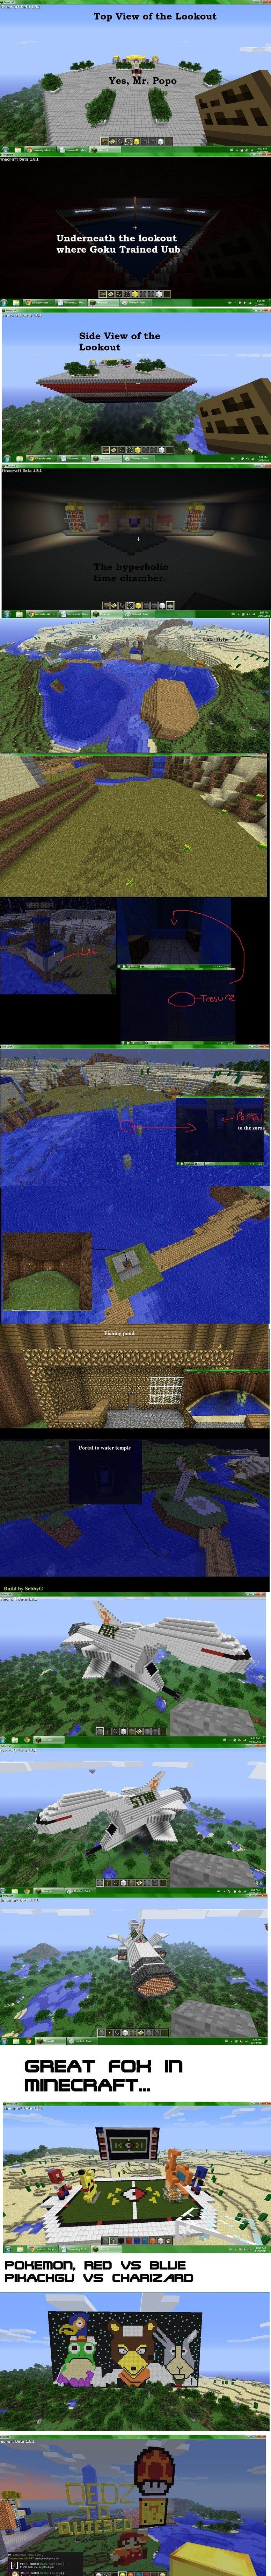 Nostalgia comp of minecraft. Made them all and now the server is close, makes me sad,.. spelt pikachu wrong